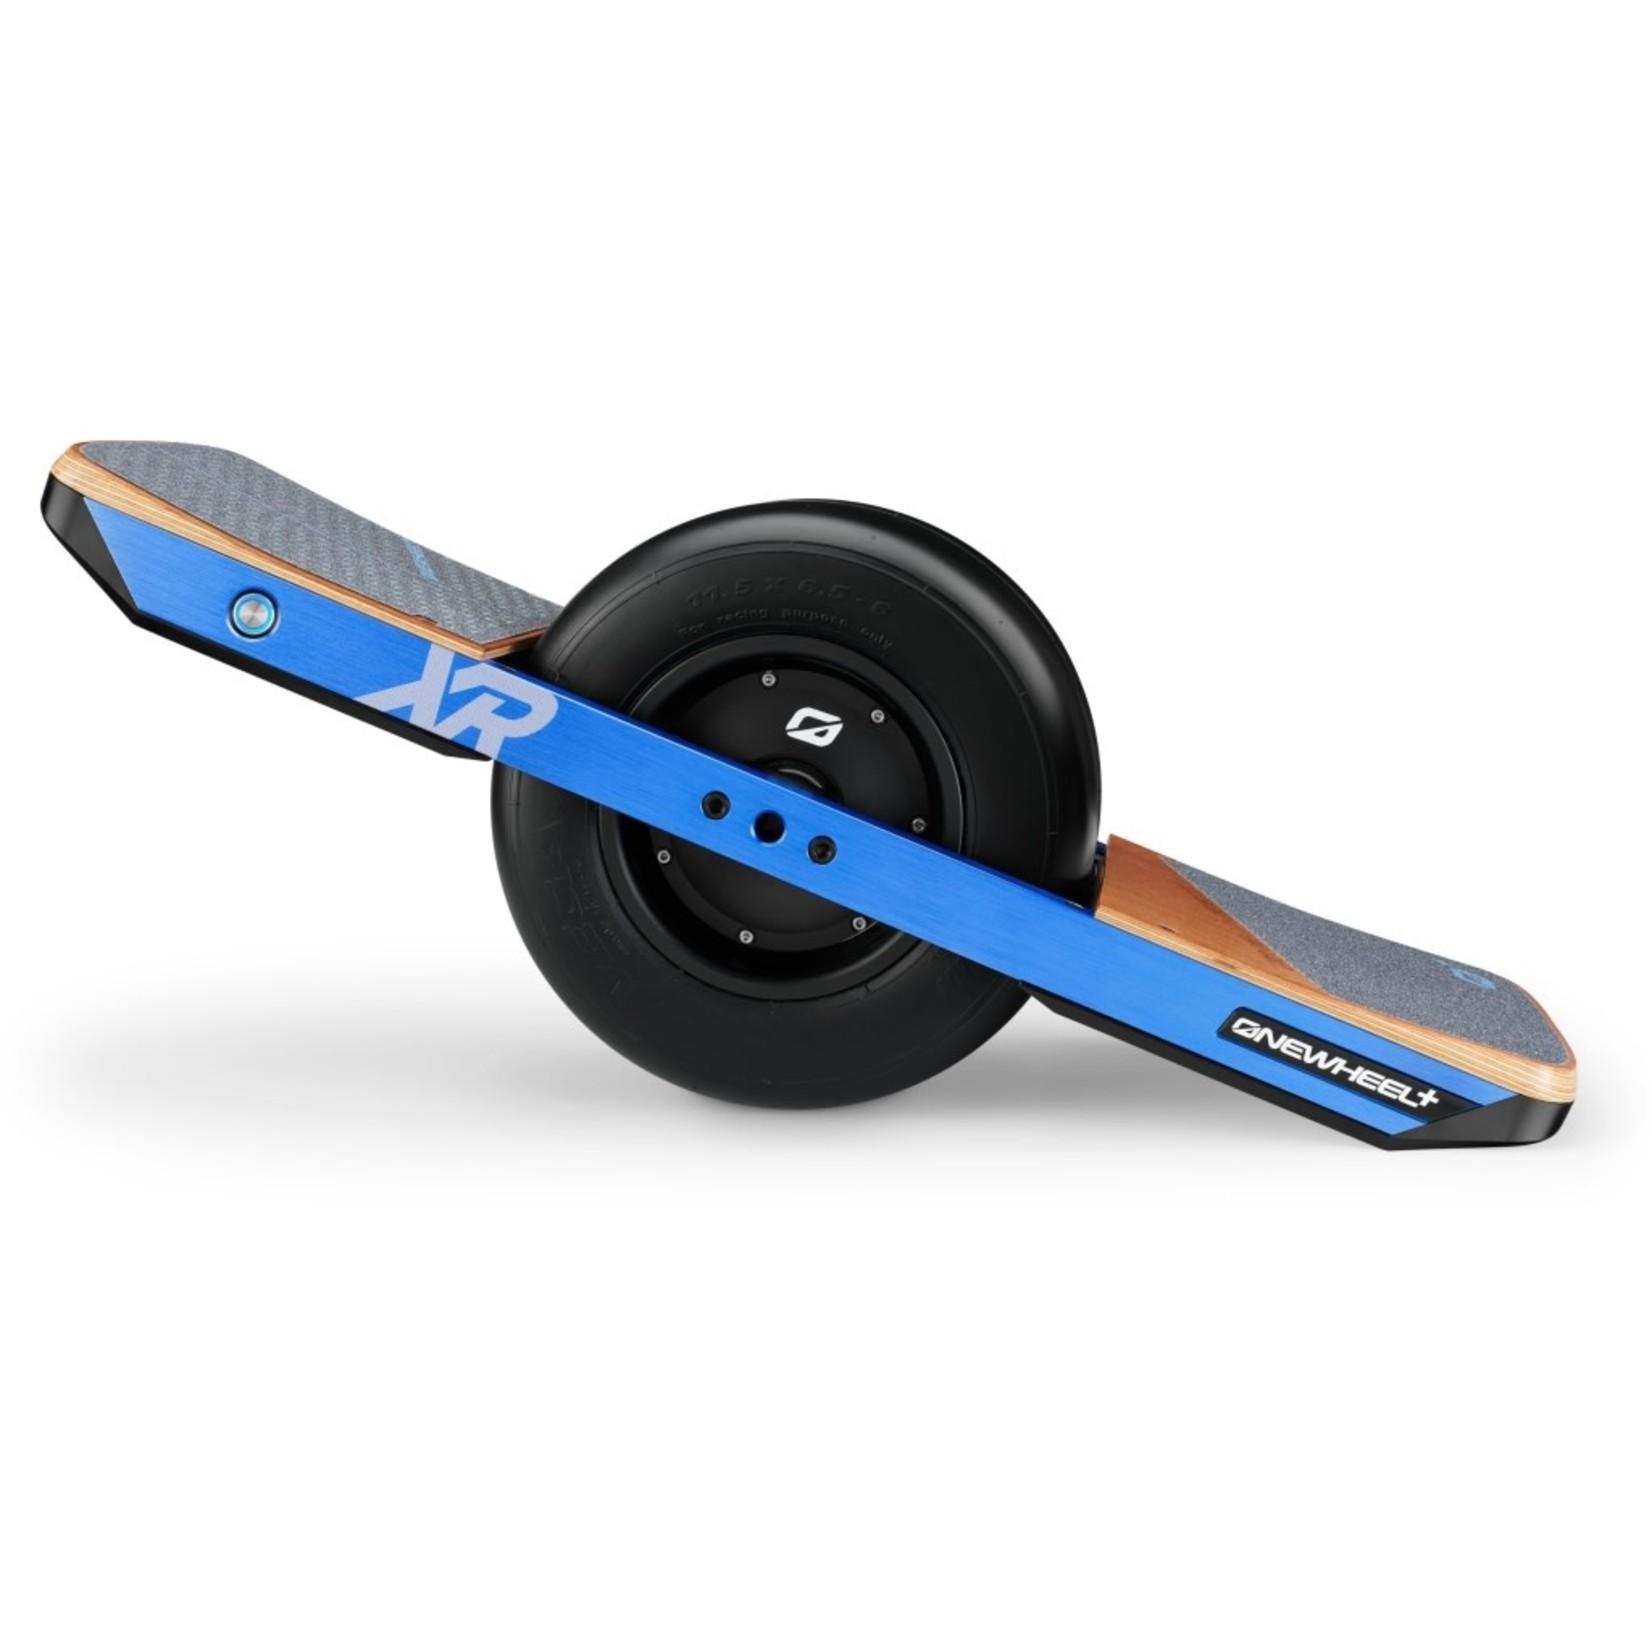 Onewheel Onewheel+ XR Electric Skateboard